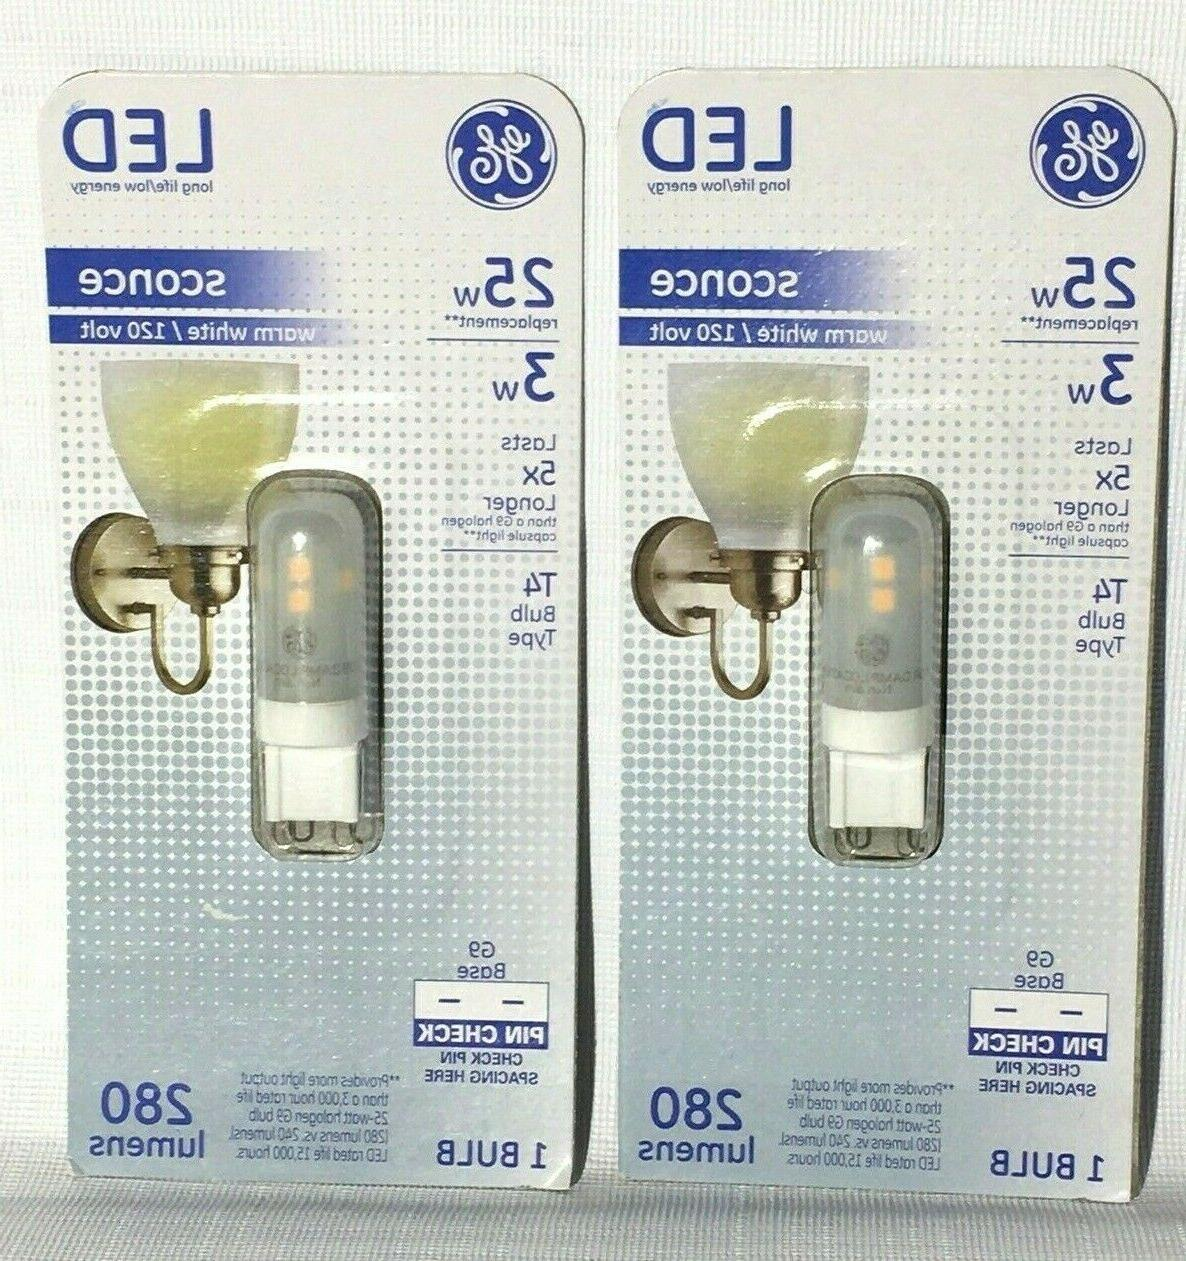 GE Lighting 29008 Frosted G9 Base T4 LED Sconce Light Bulb,